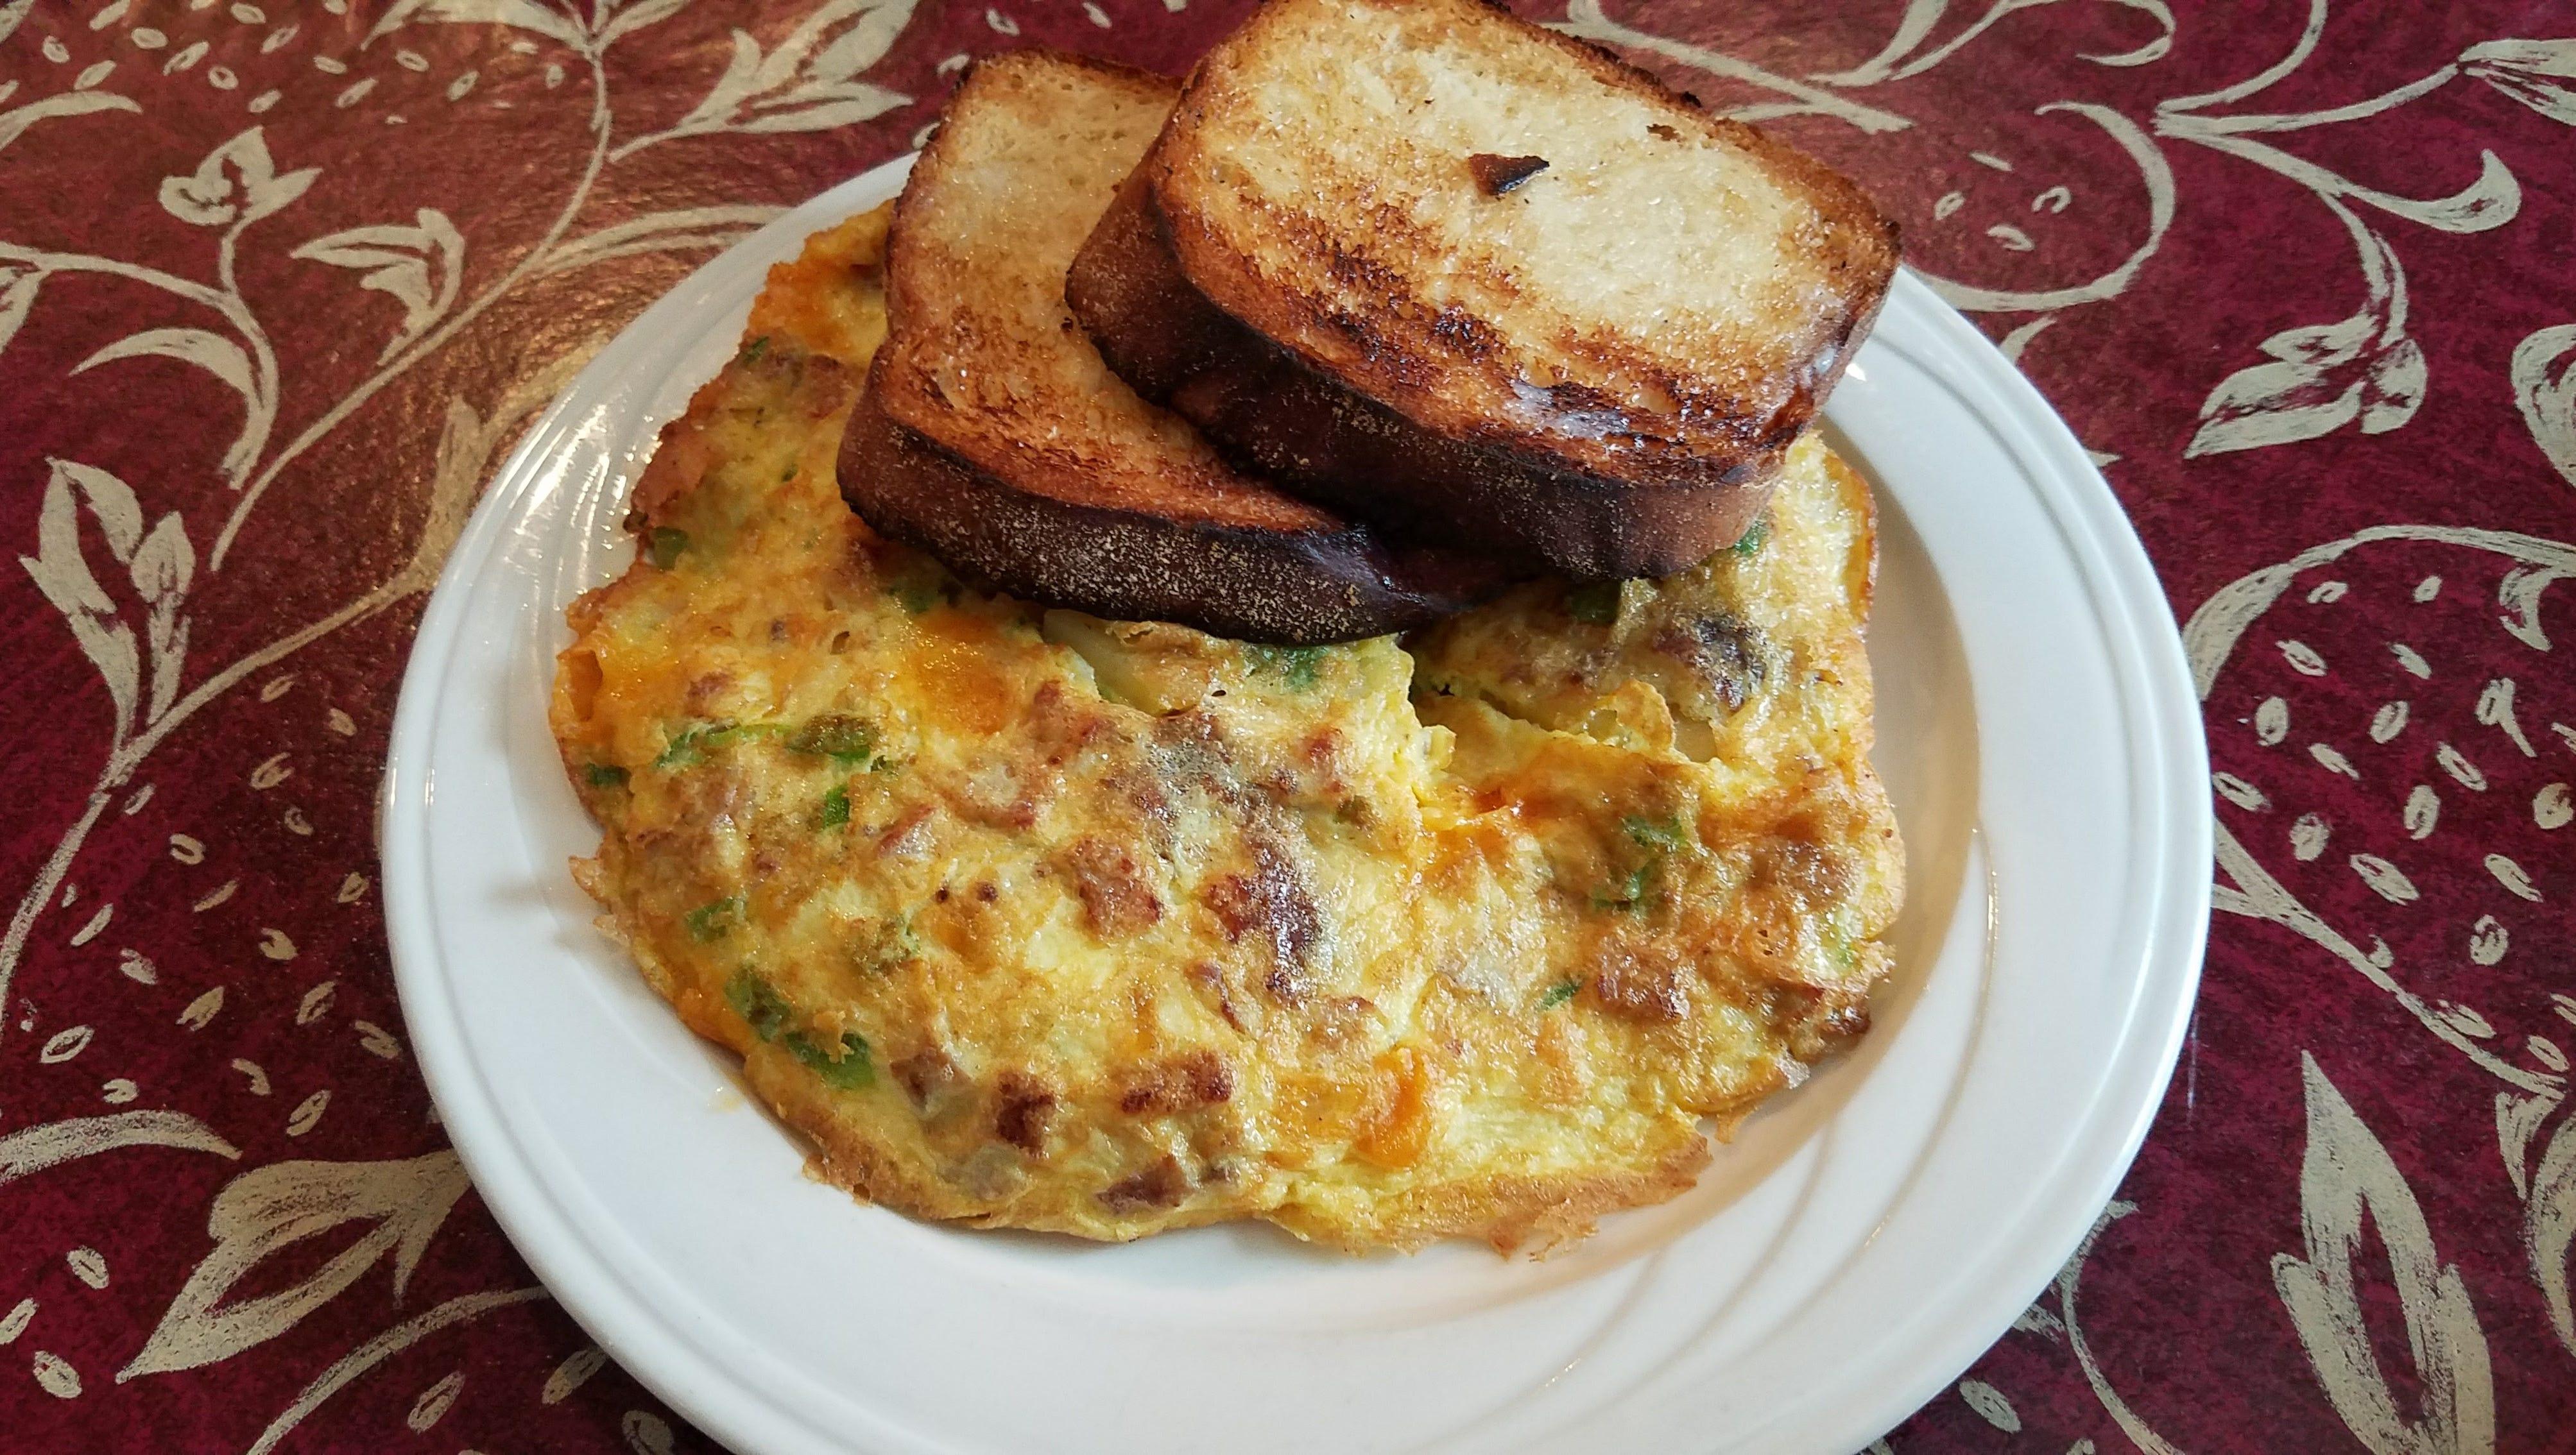 Food At Fishers Station Serves Meltaway Pancakes